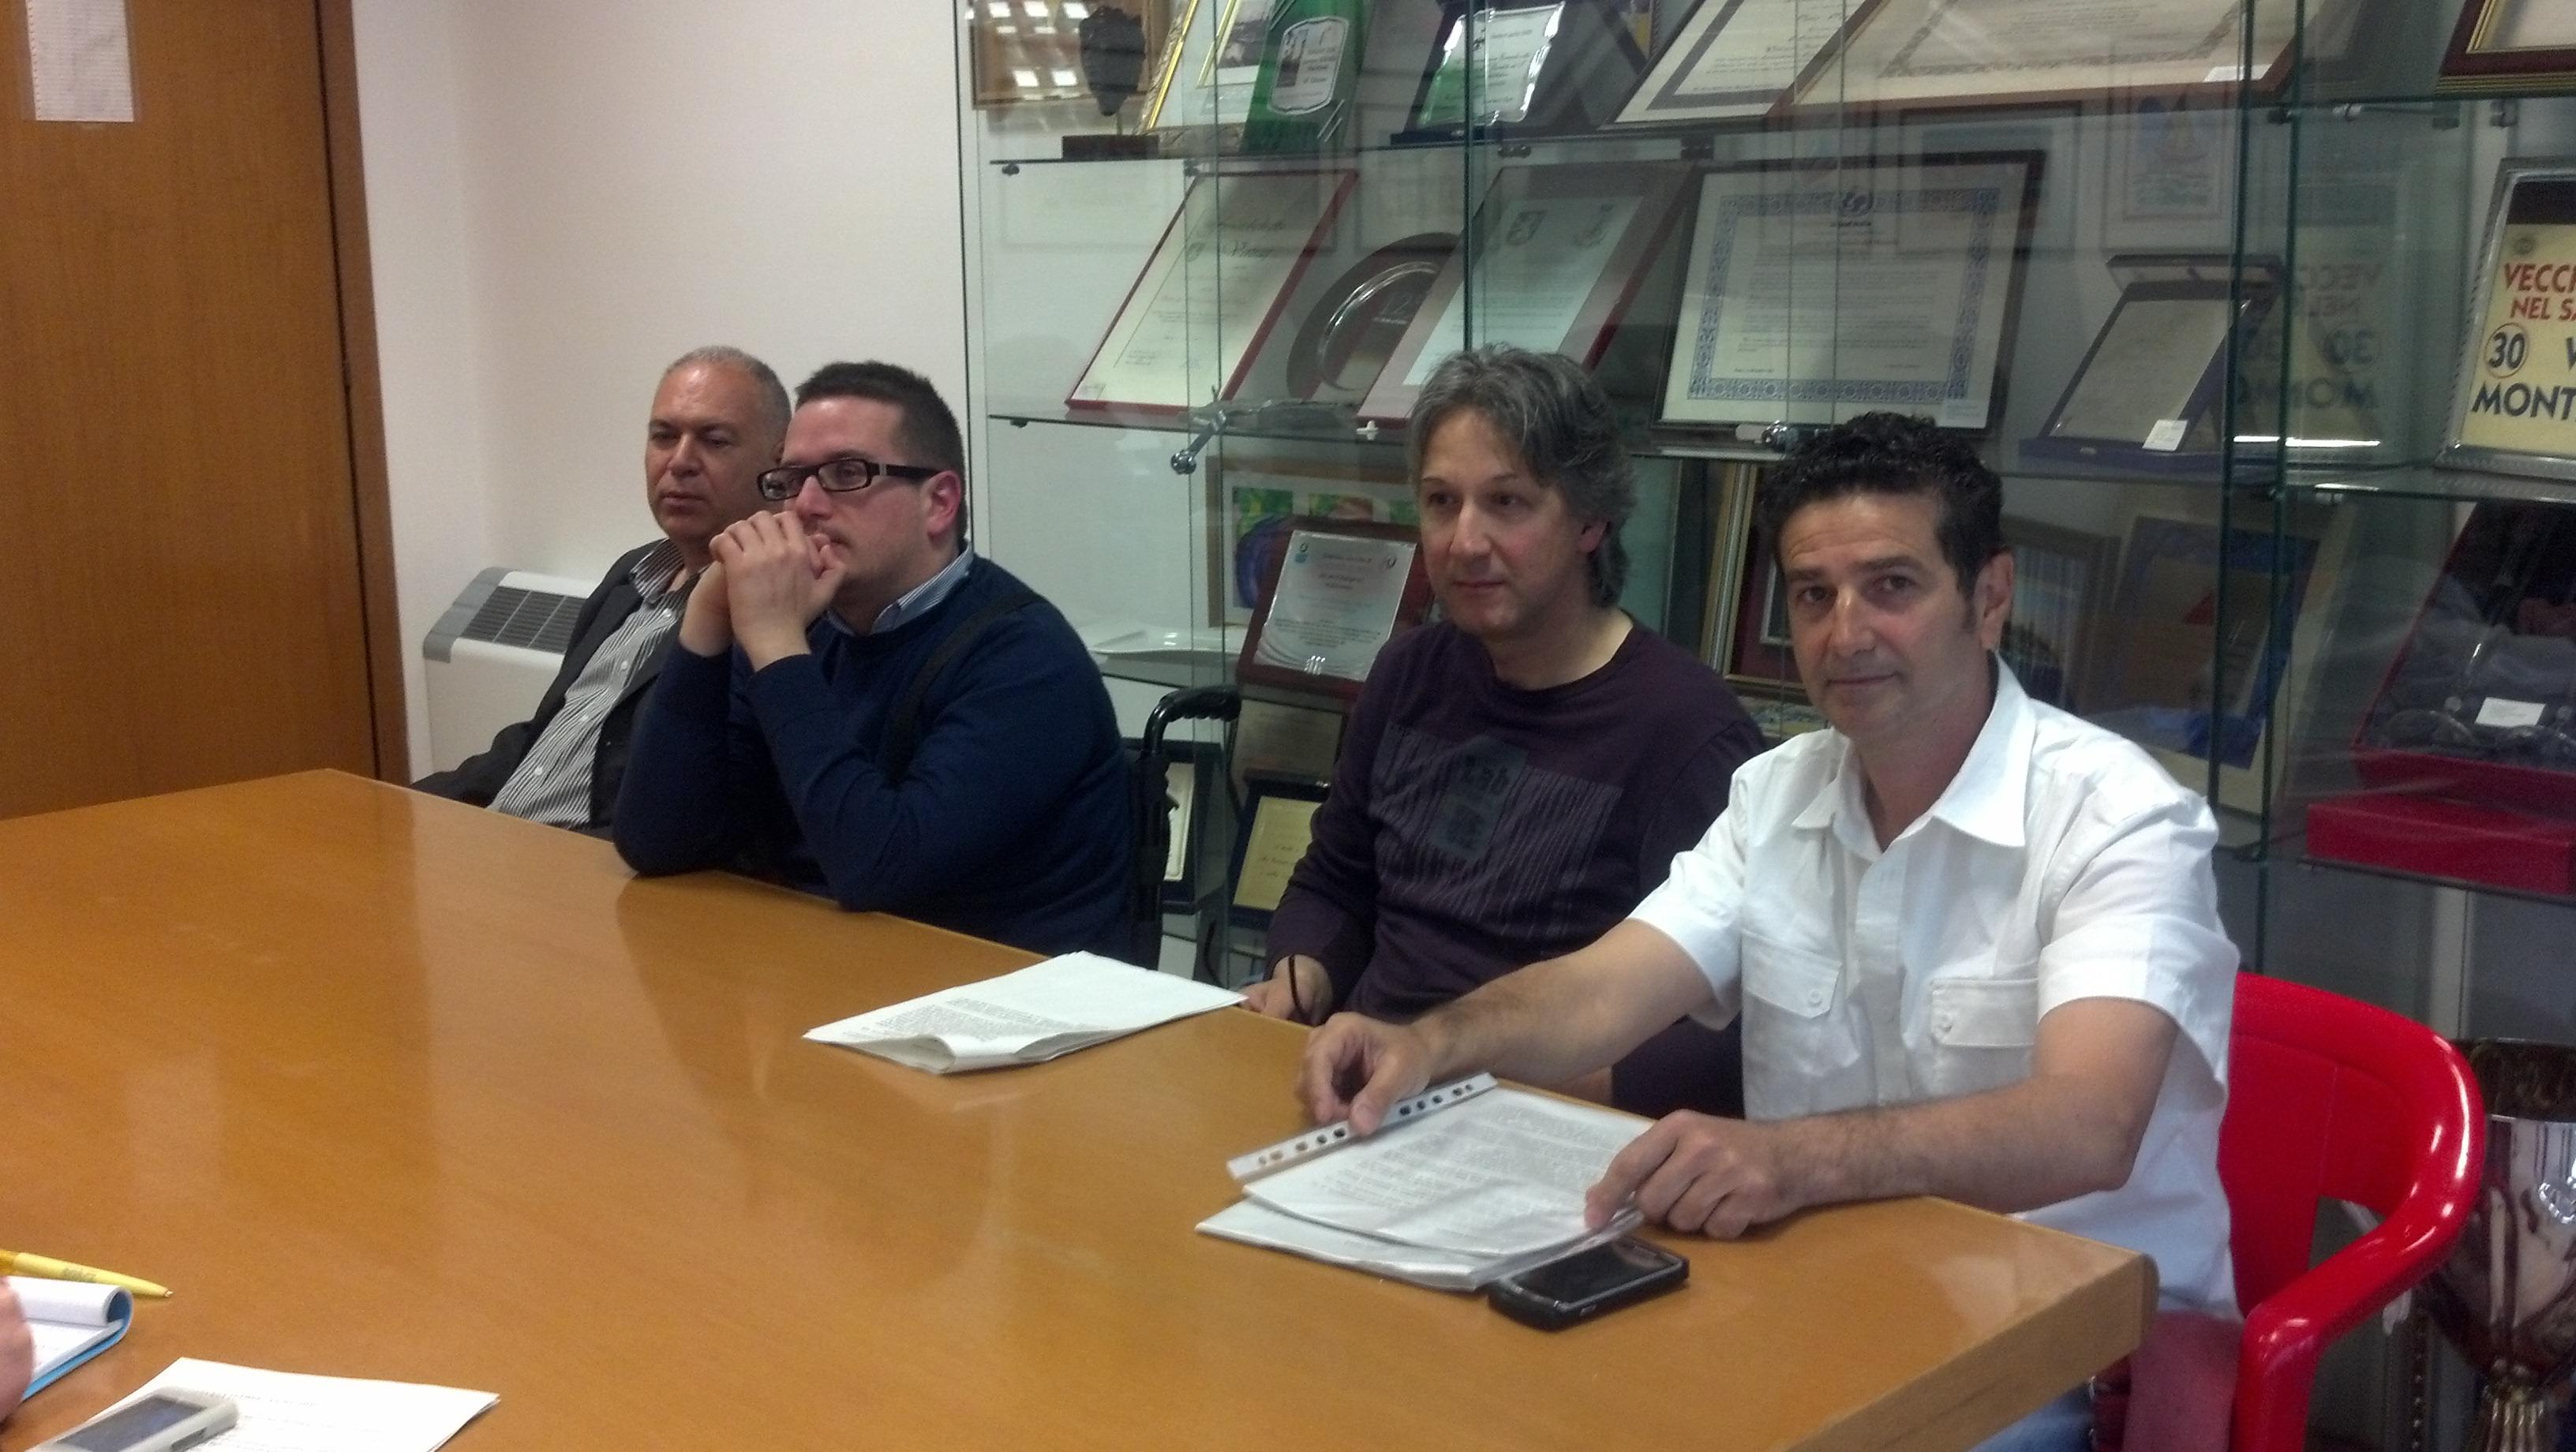 Natale Reda, Jonni Perozzi, Alfredo Vitali, Massimo Bartolozzi